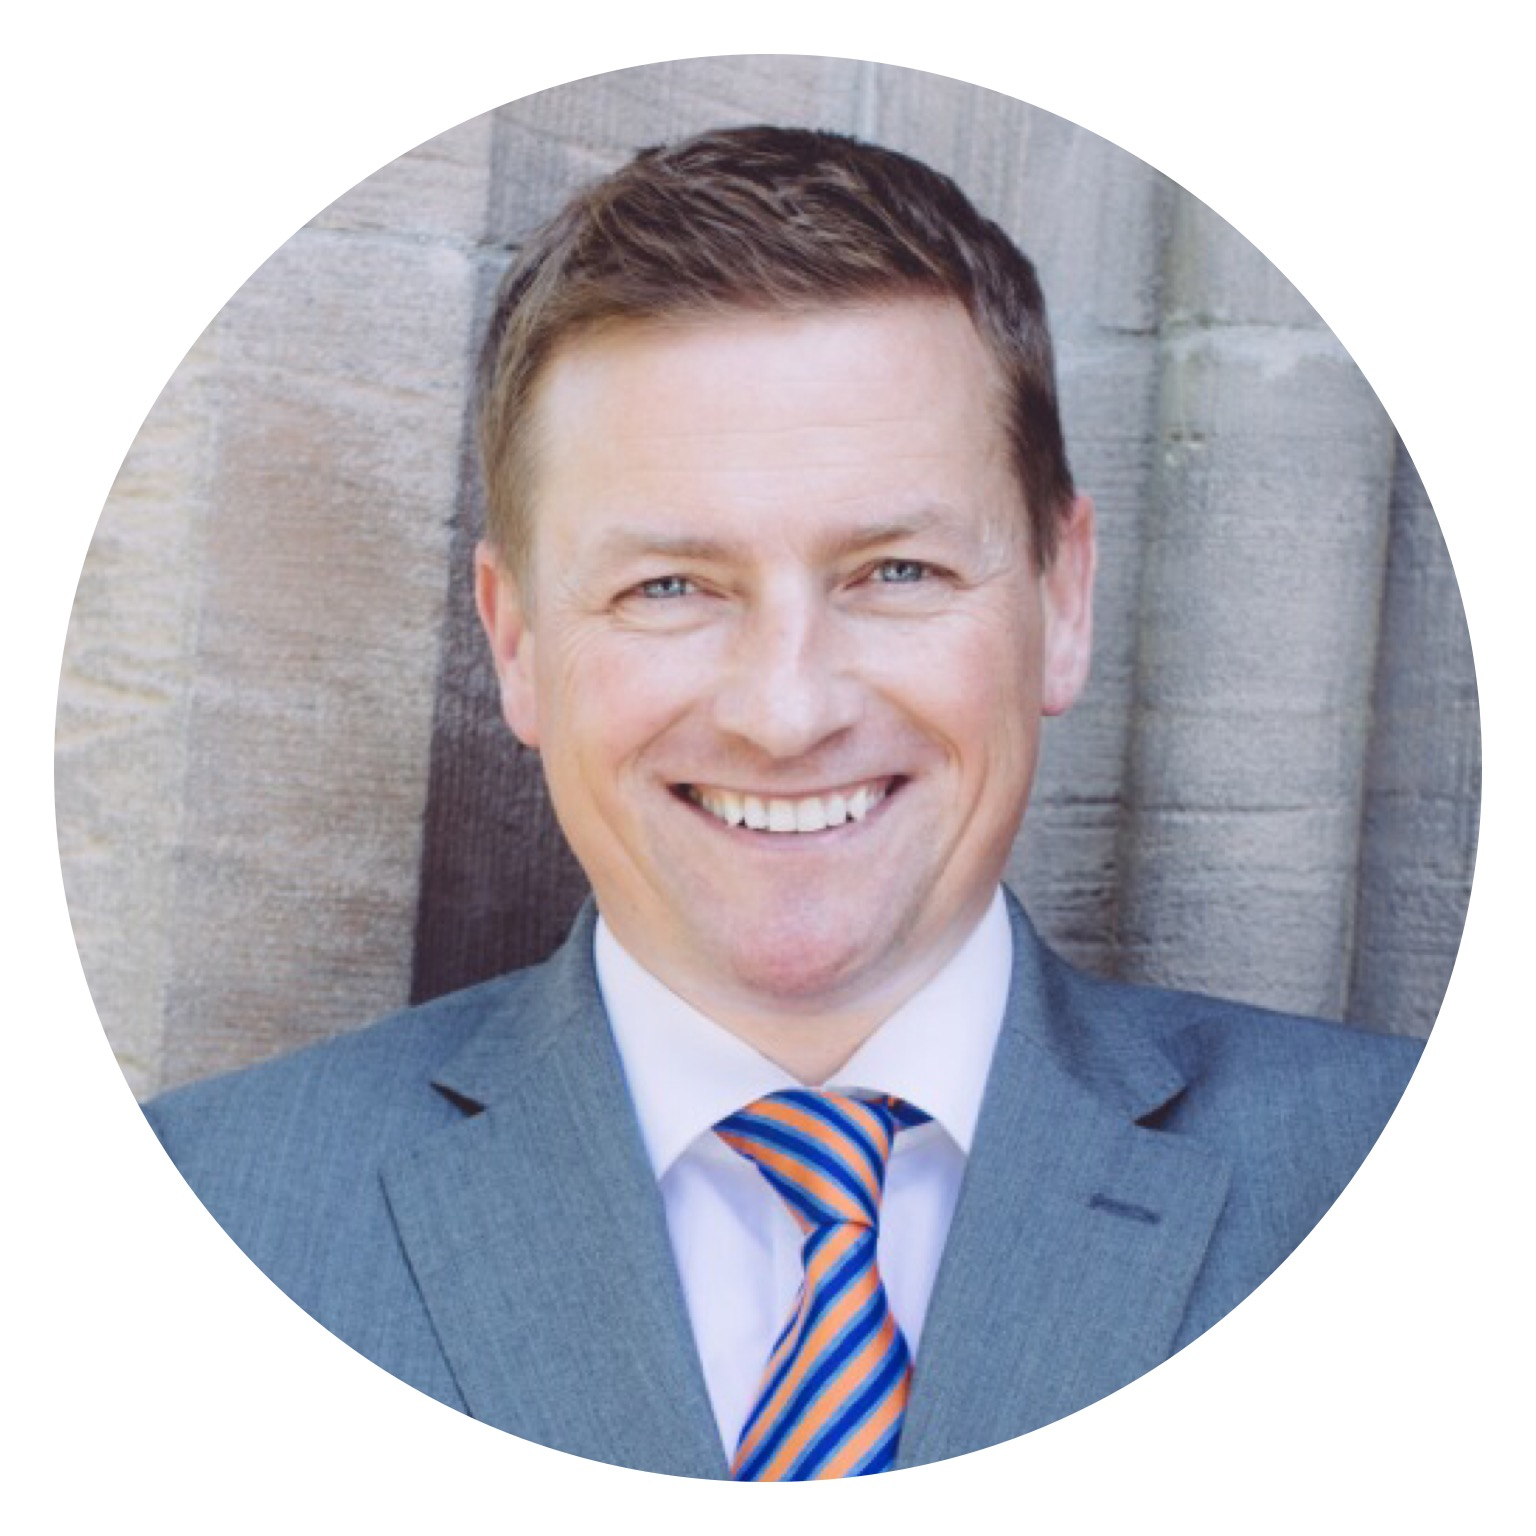 Chris Hill - OPSA Trustee